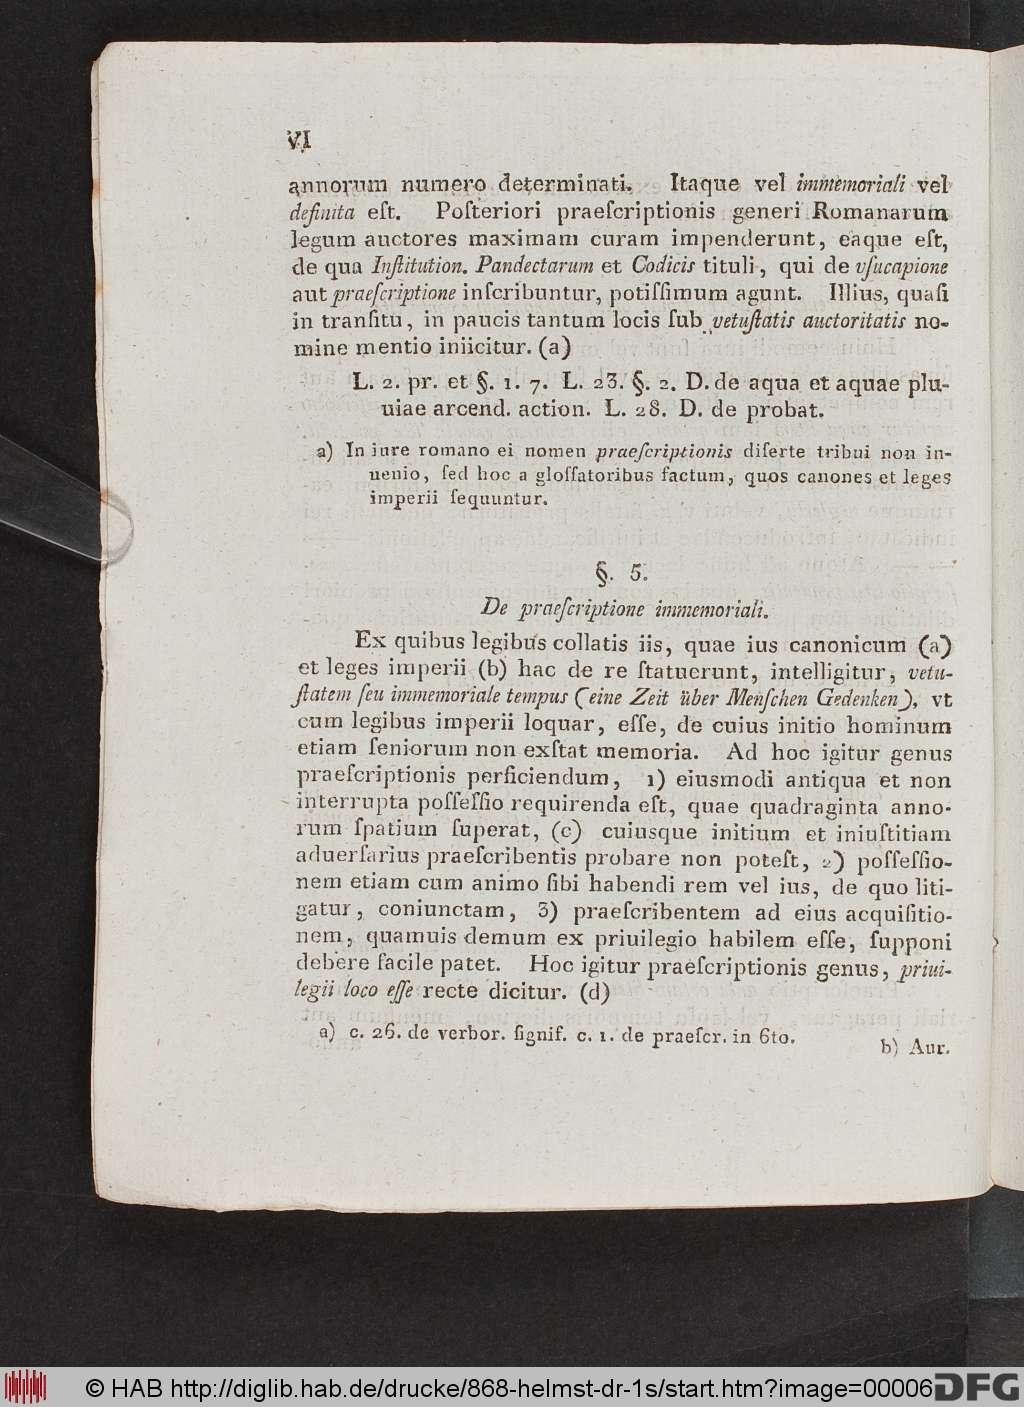 https://diglib.hab.de/drucke/868-helmst-dr-1s/00006.jpg